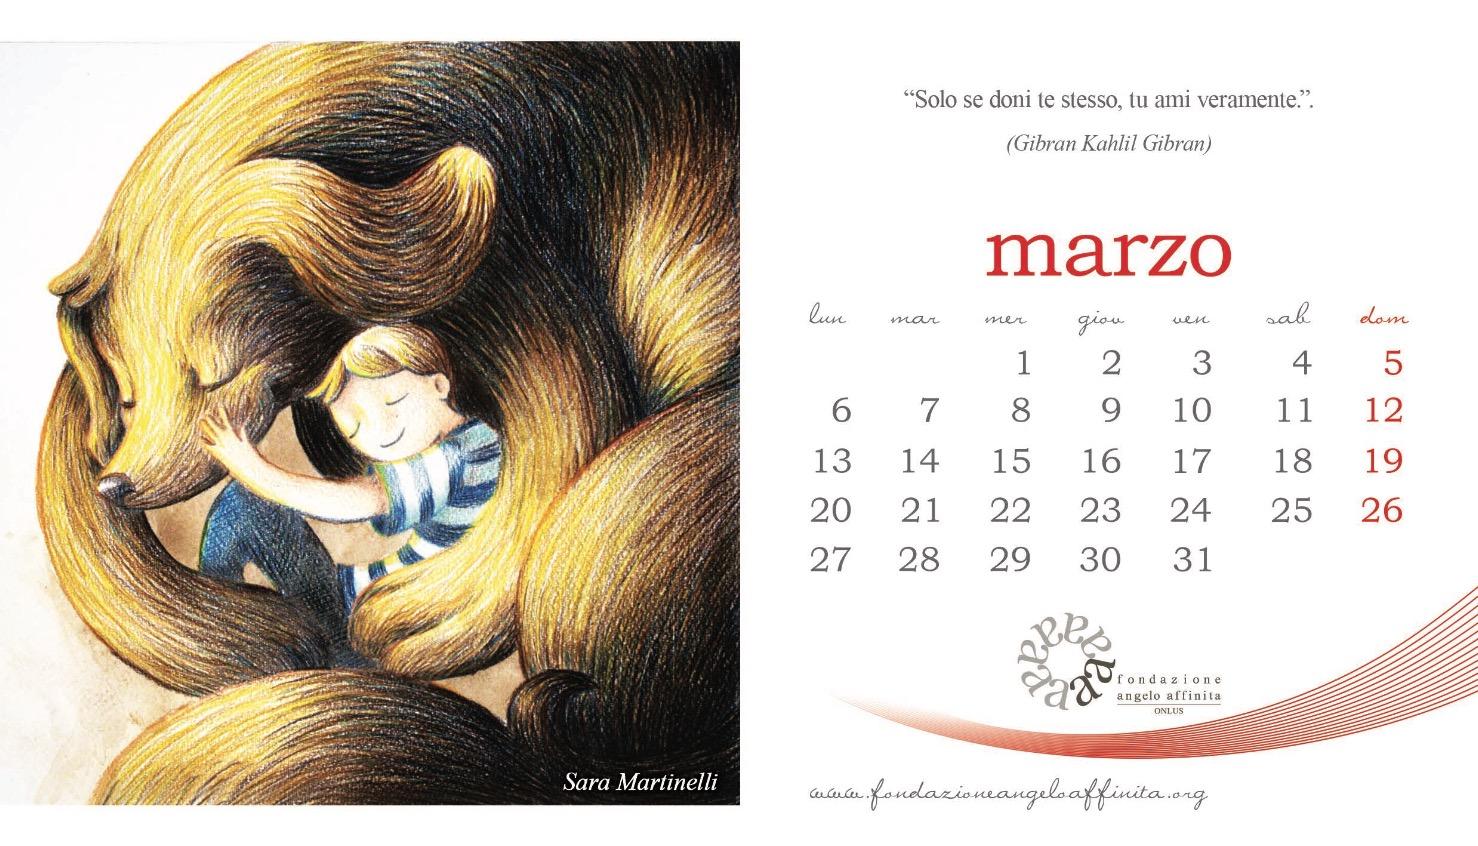 calendario-2017-fondazione-angelo-affinita_4